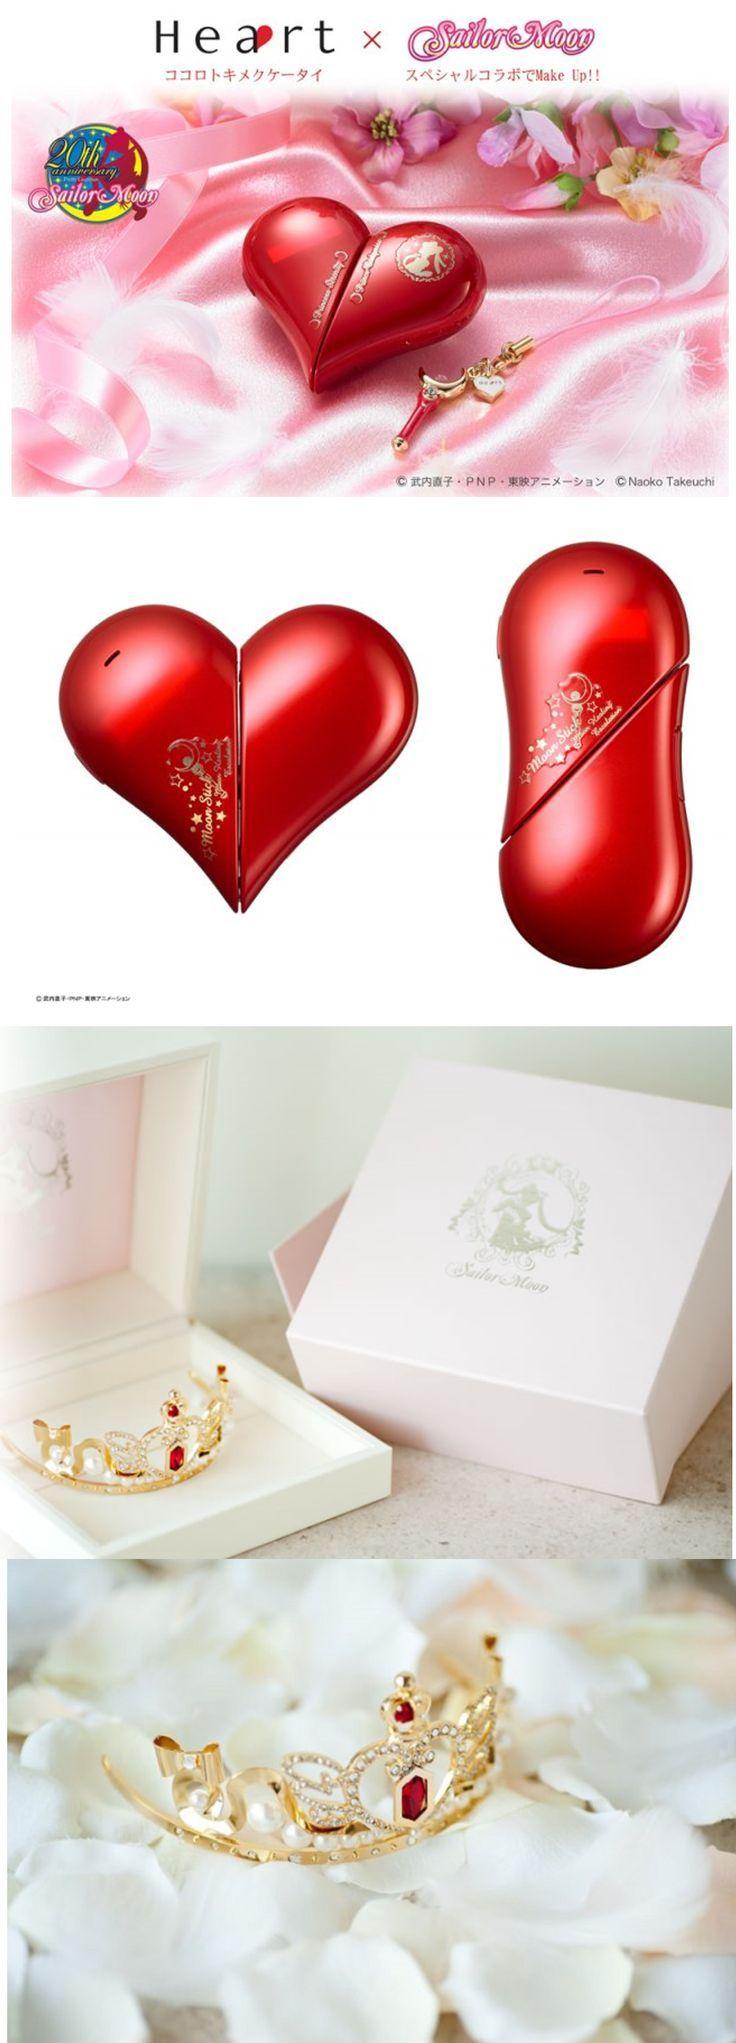 Best 11 Sailor Moon Wedding images on Pinterest | Sailor moon ...